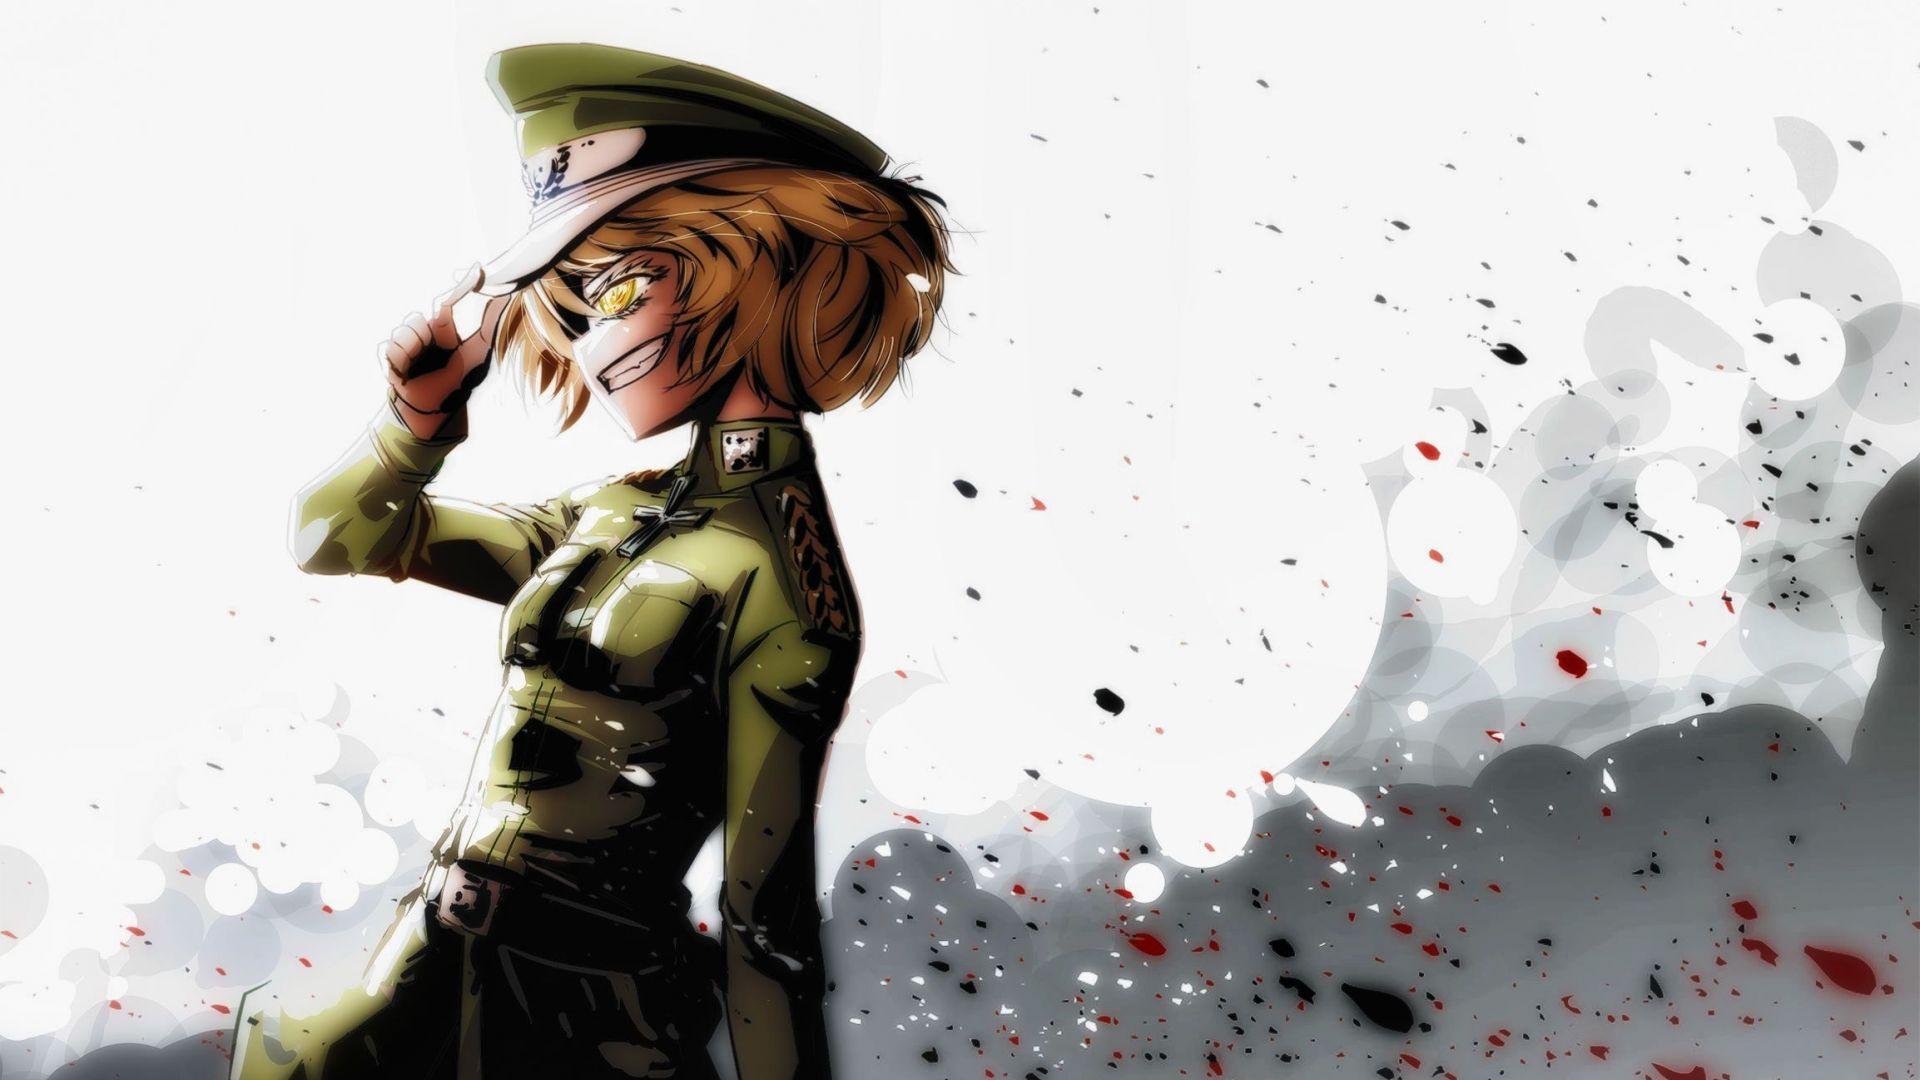 Wallpaper Engine Gun Anime Girl Desktop Wallpaper Youjo Senki Army Tanya Anime Girl Hd